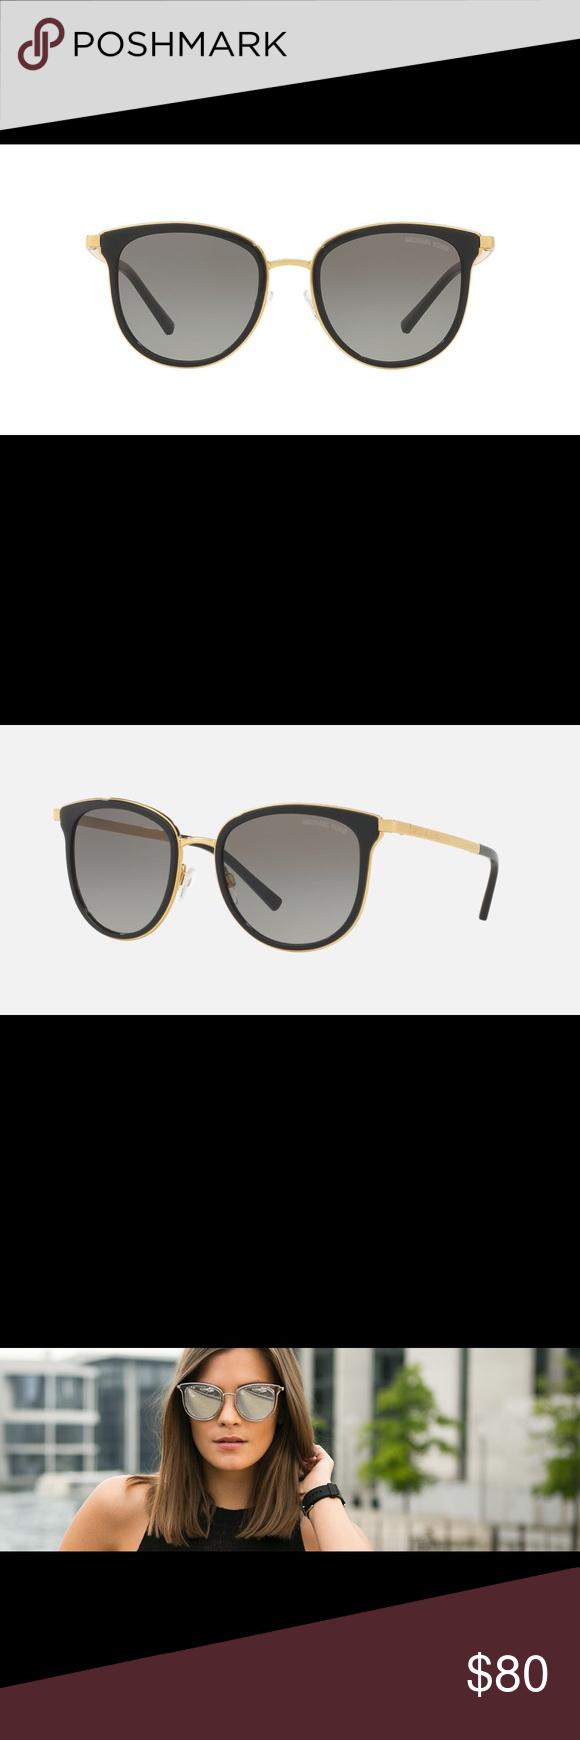 Michael Kors Adrianna sunglasses Black and gold sunglasses with case! Michael Kors Accessories Sunglasses